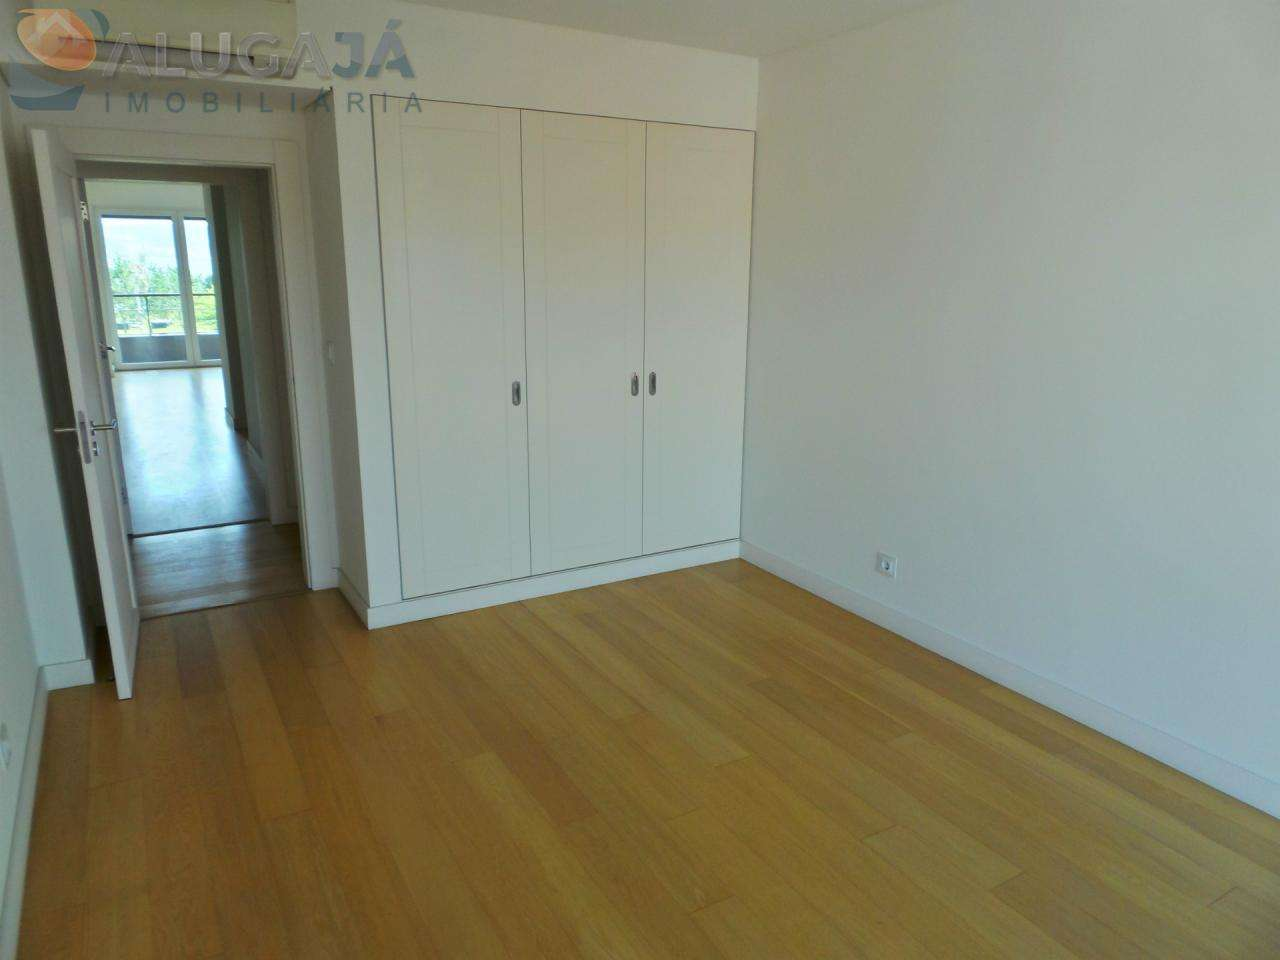 Apartamento para comprar, Belém, Lisboa - Foto 36